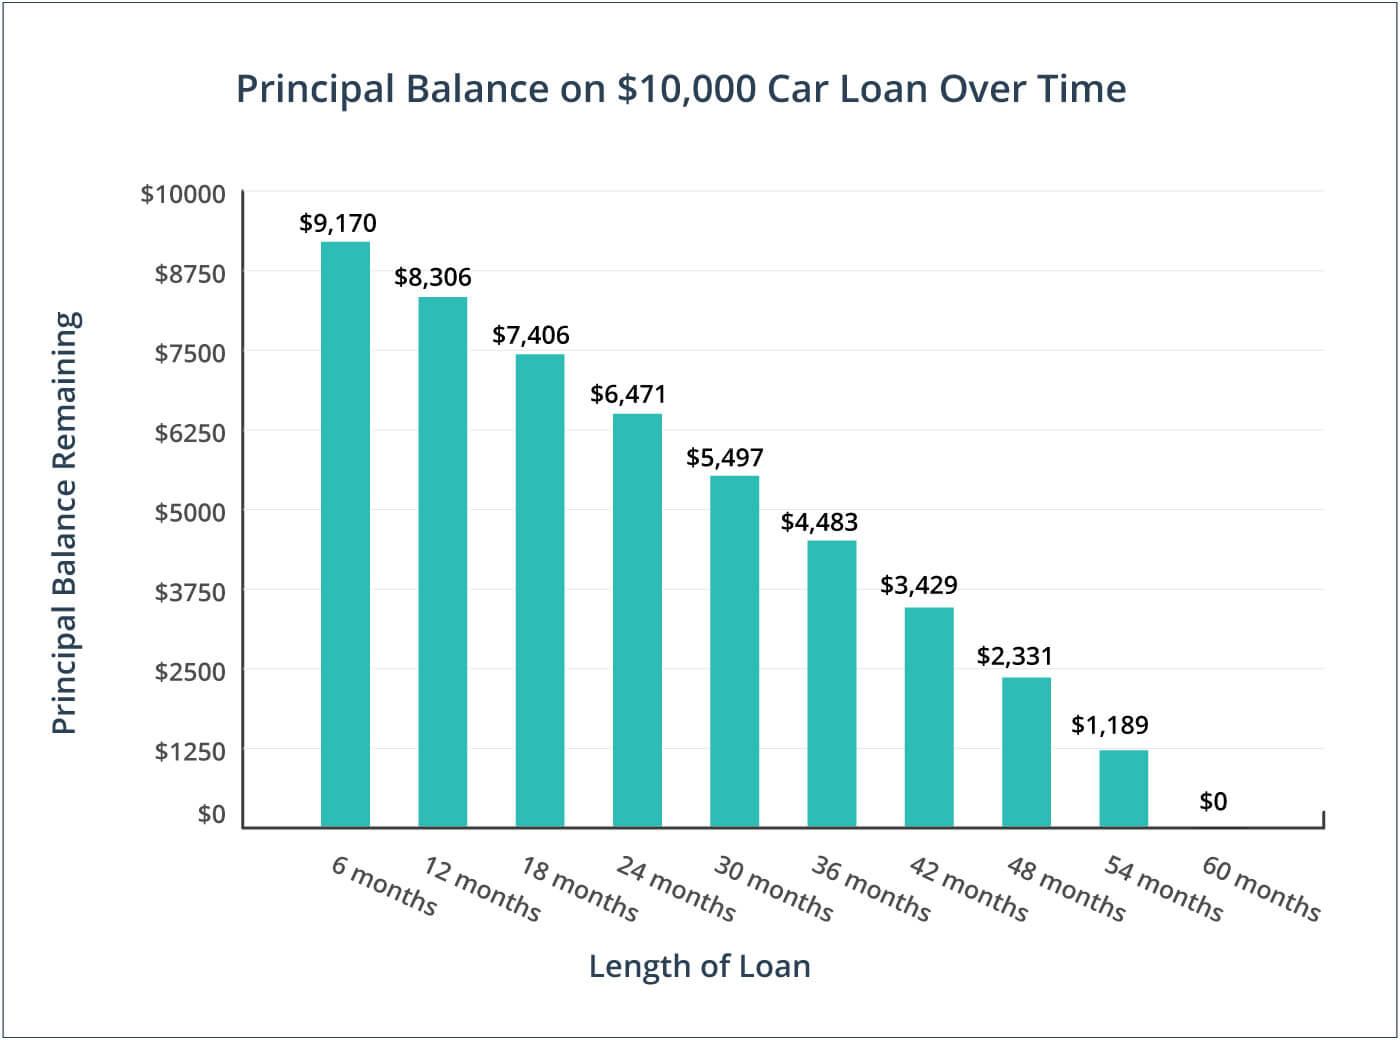 Paying Principal On Car Loan